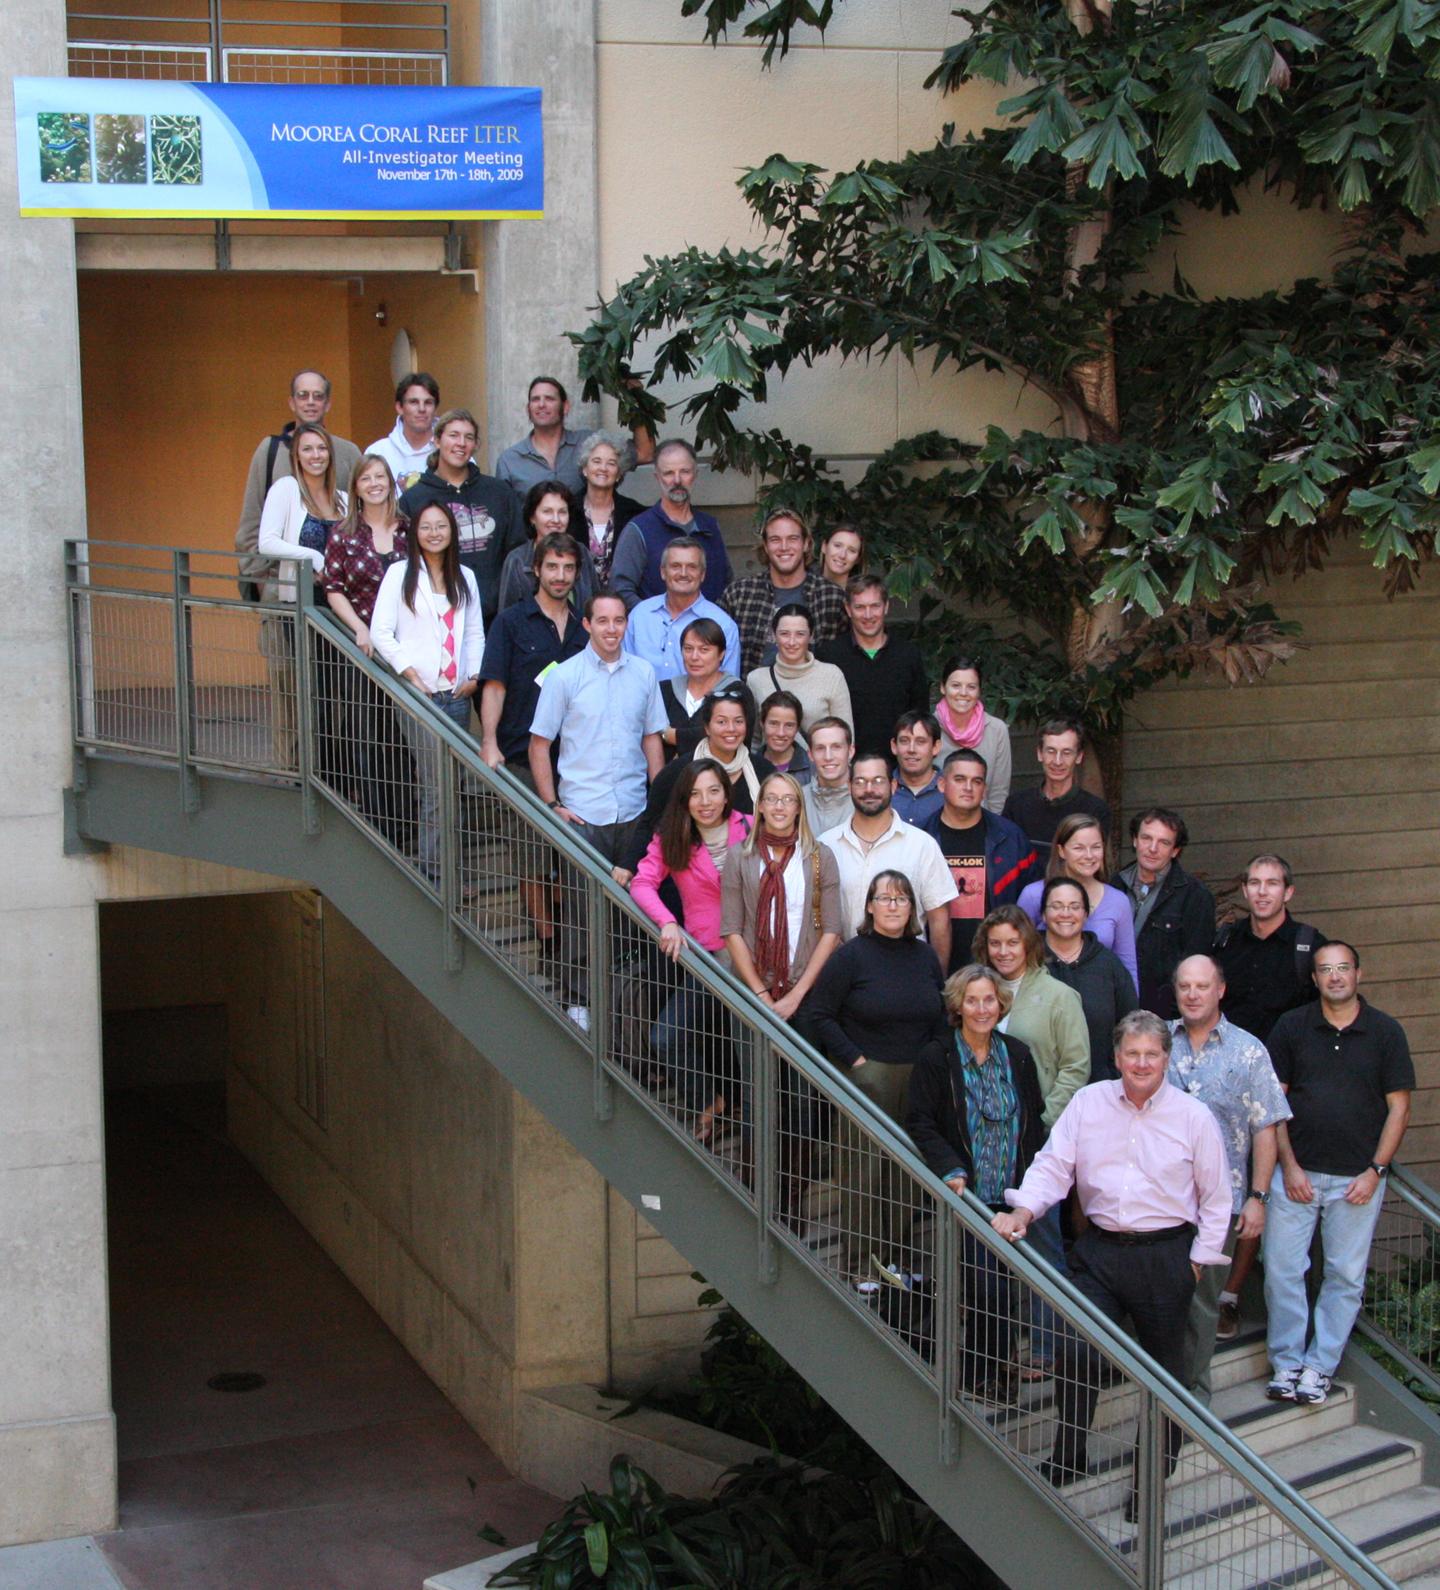 2009 MCR All Investigators Meeting photo